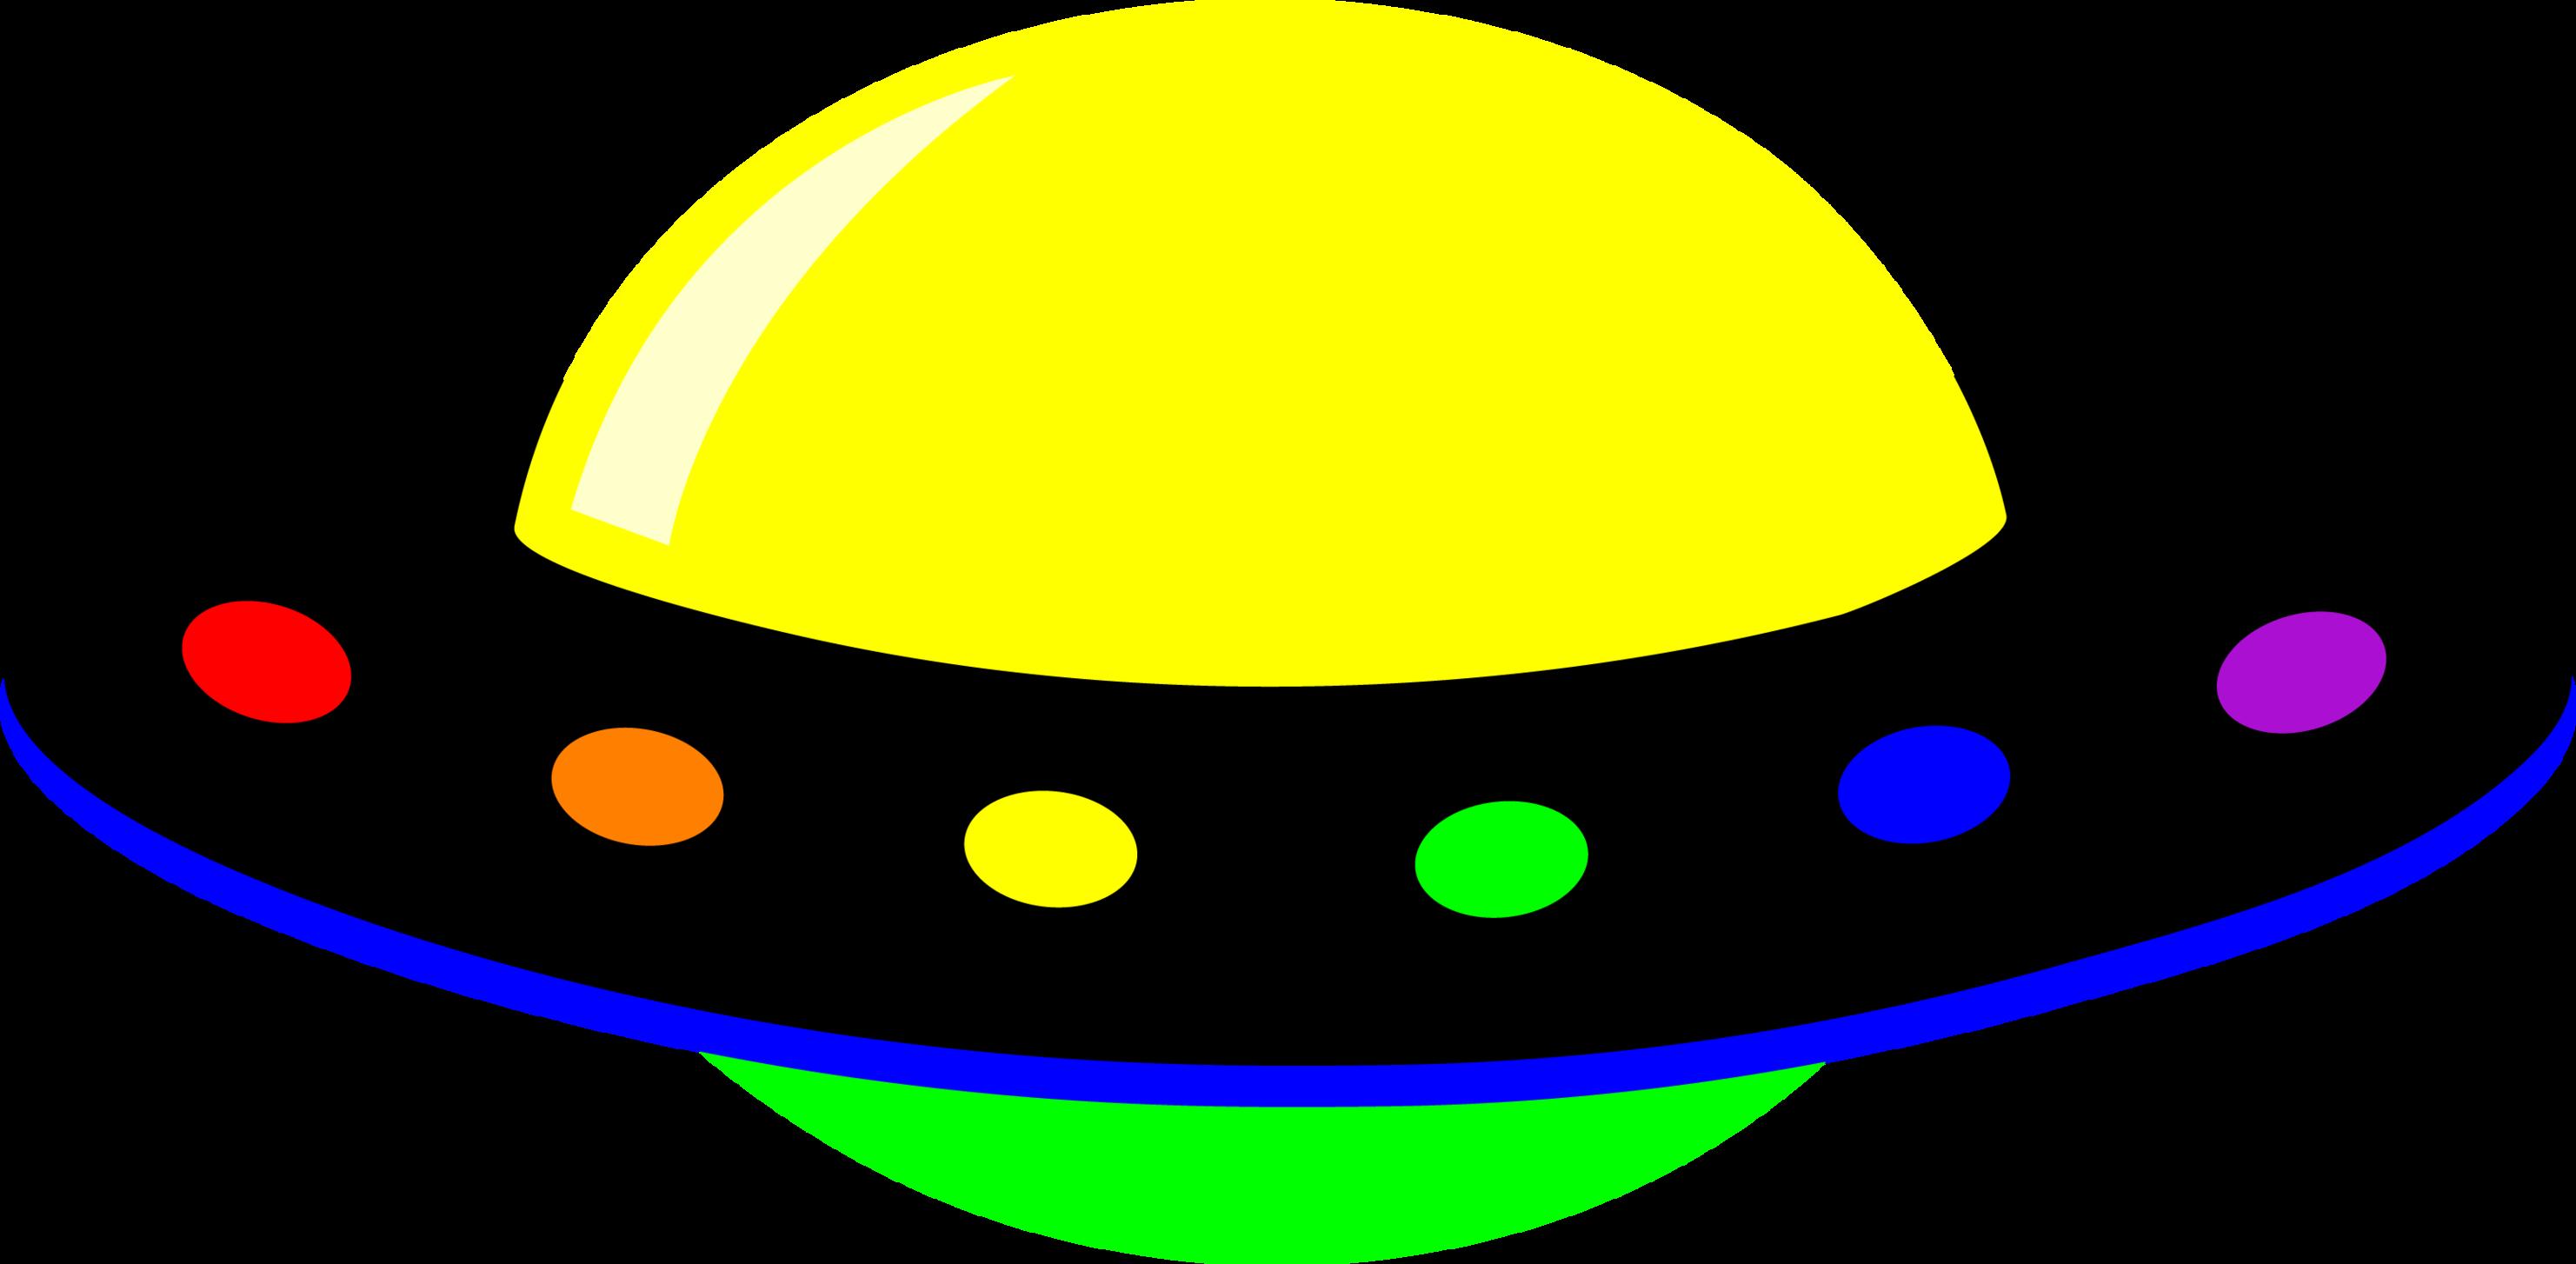 Spaceship Clip Art